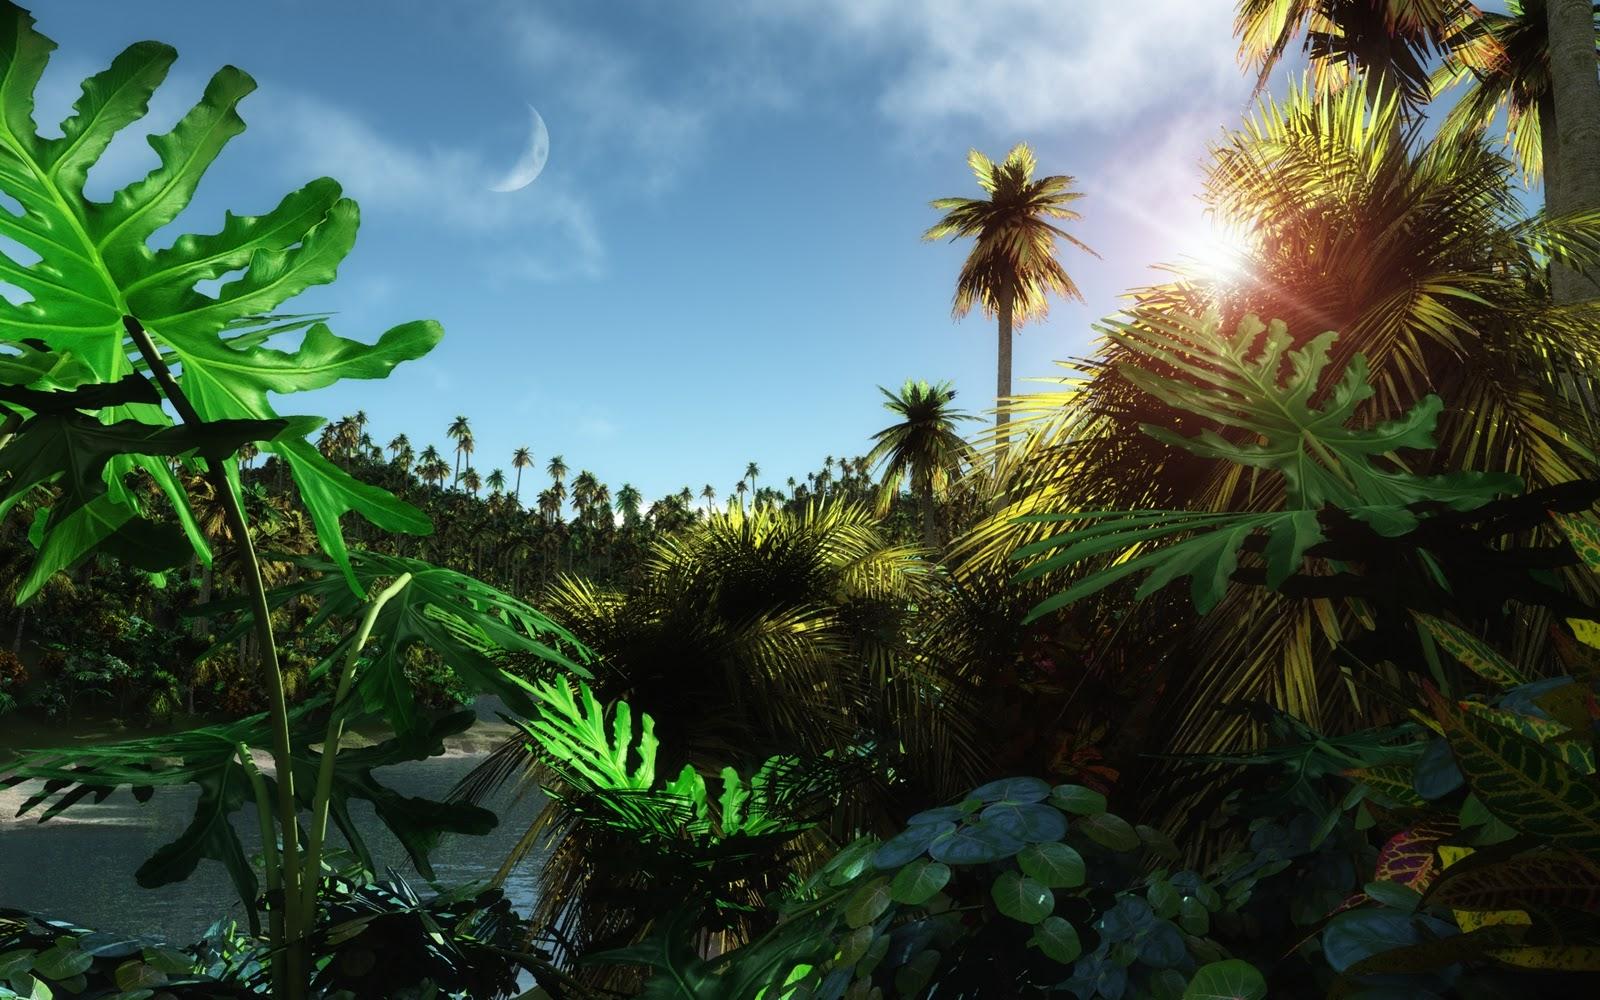 3D Nature Wallpapers -Jungle Wallpapers 2012|HD Desktop 3D ...